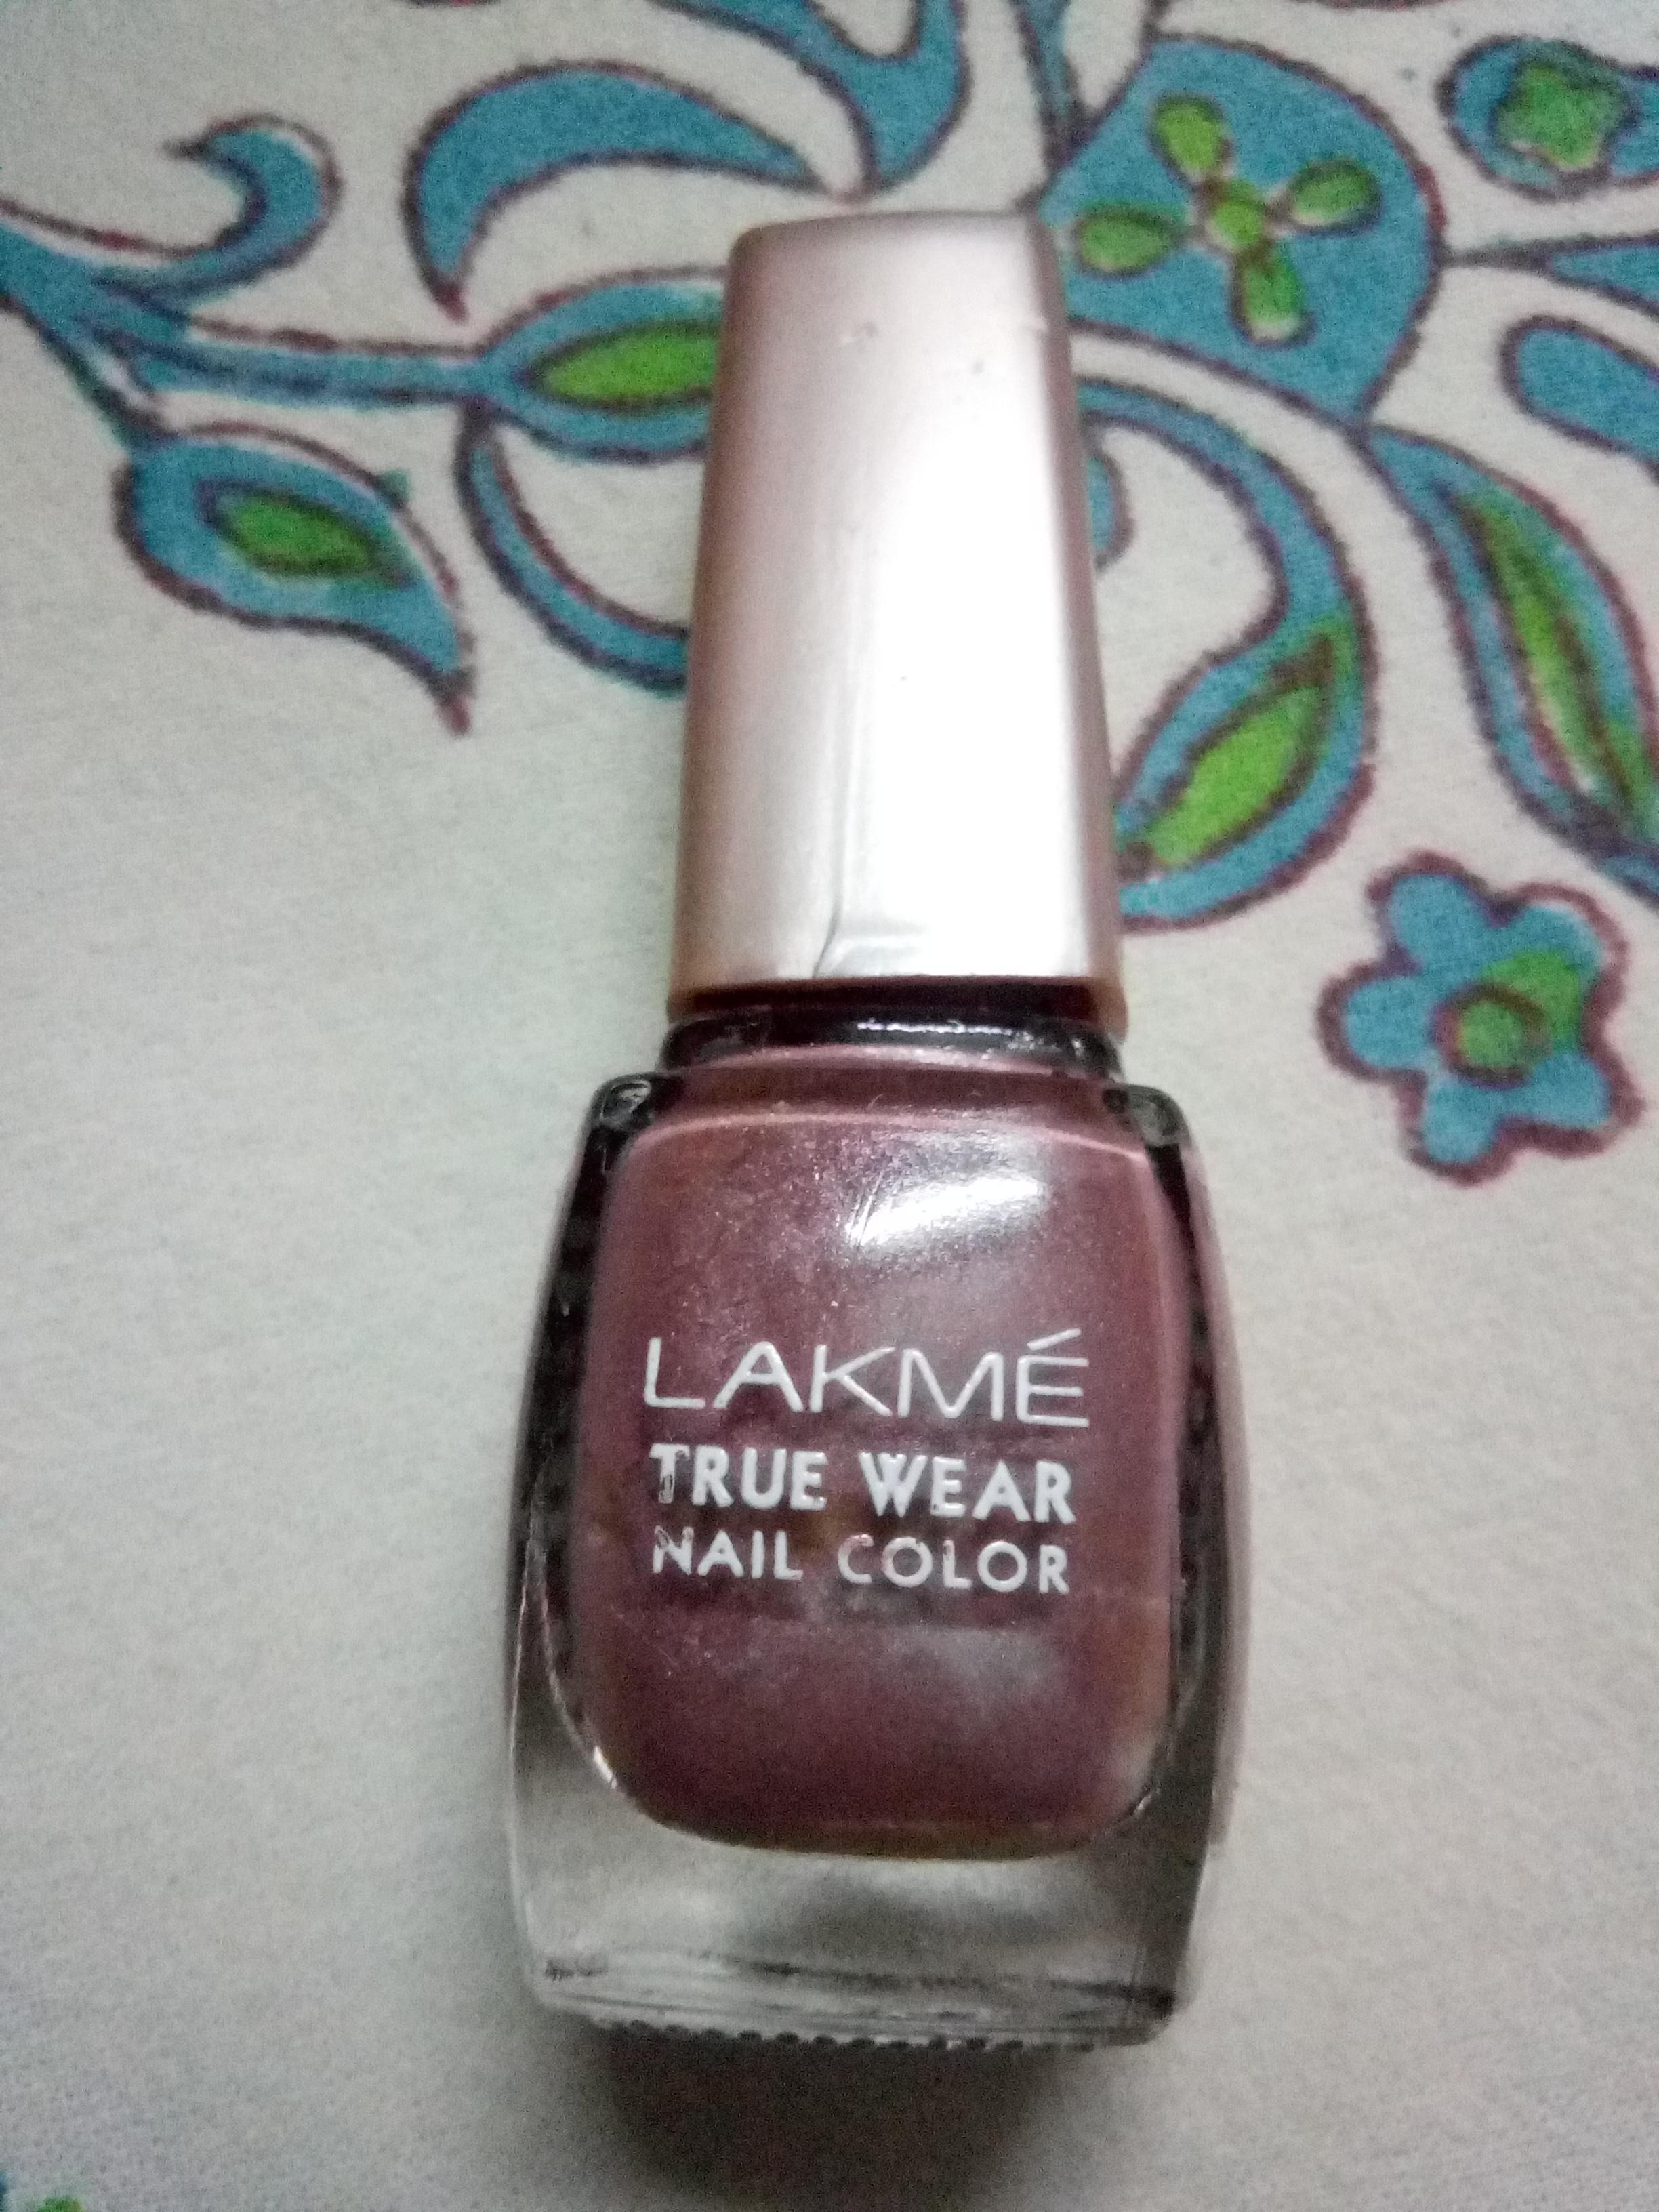 Lakme True Wear Color Crush -Lakme True Wear Color Crush-By aflyingsoul